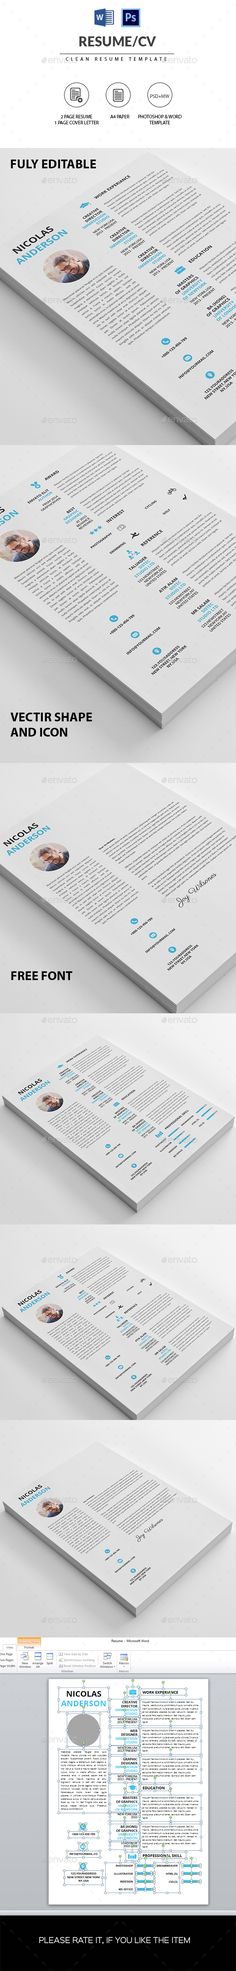 CV Resume Template Download here   graphicrivernet/item/cv